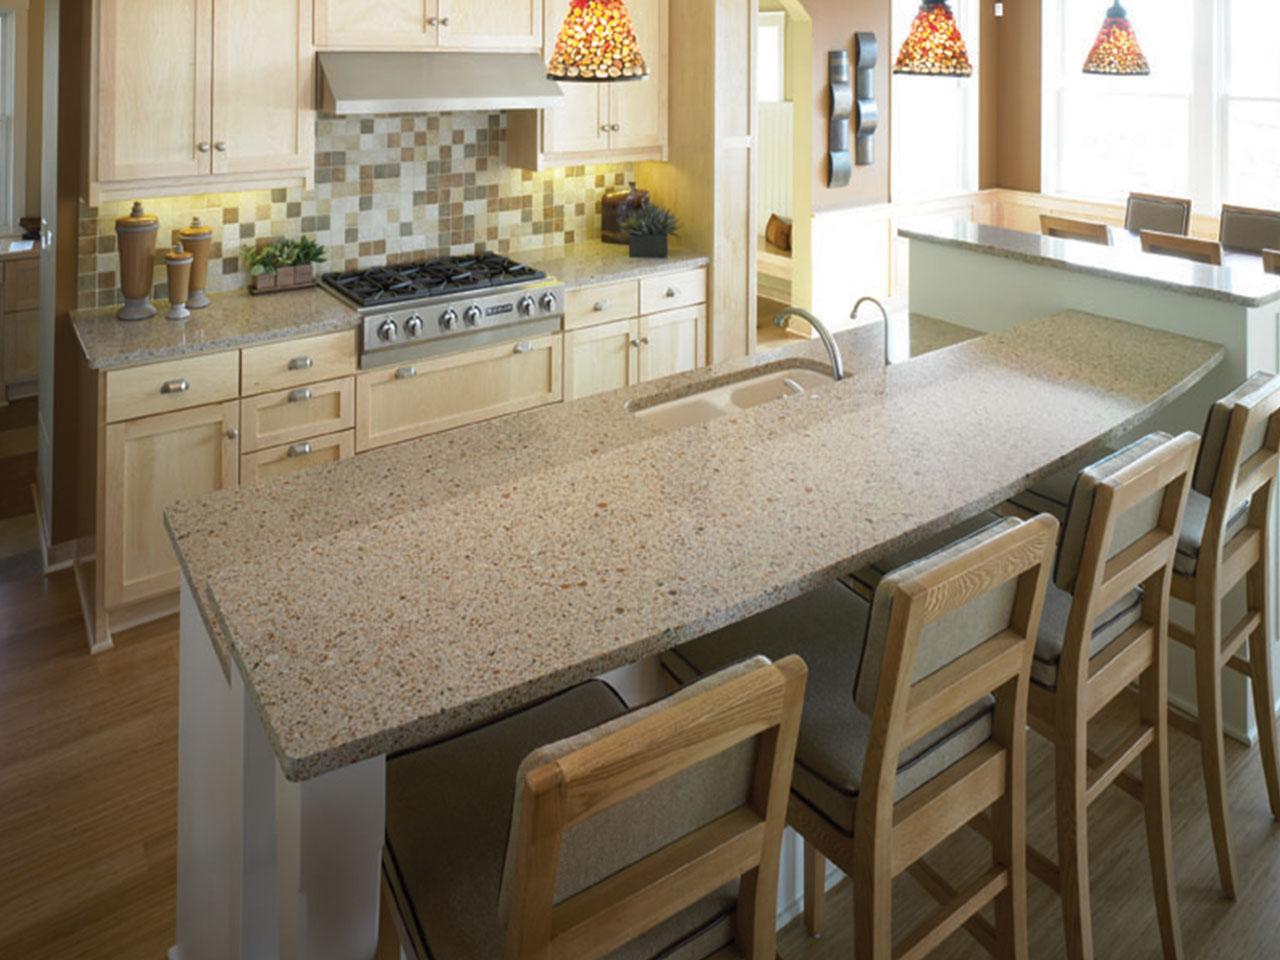 Cambria Quartz Kitchen Ideas Kitchen Appliances Tips And Review